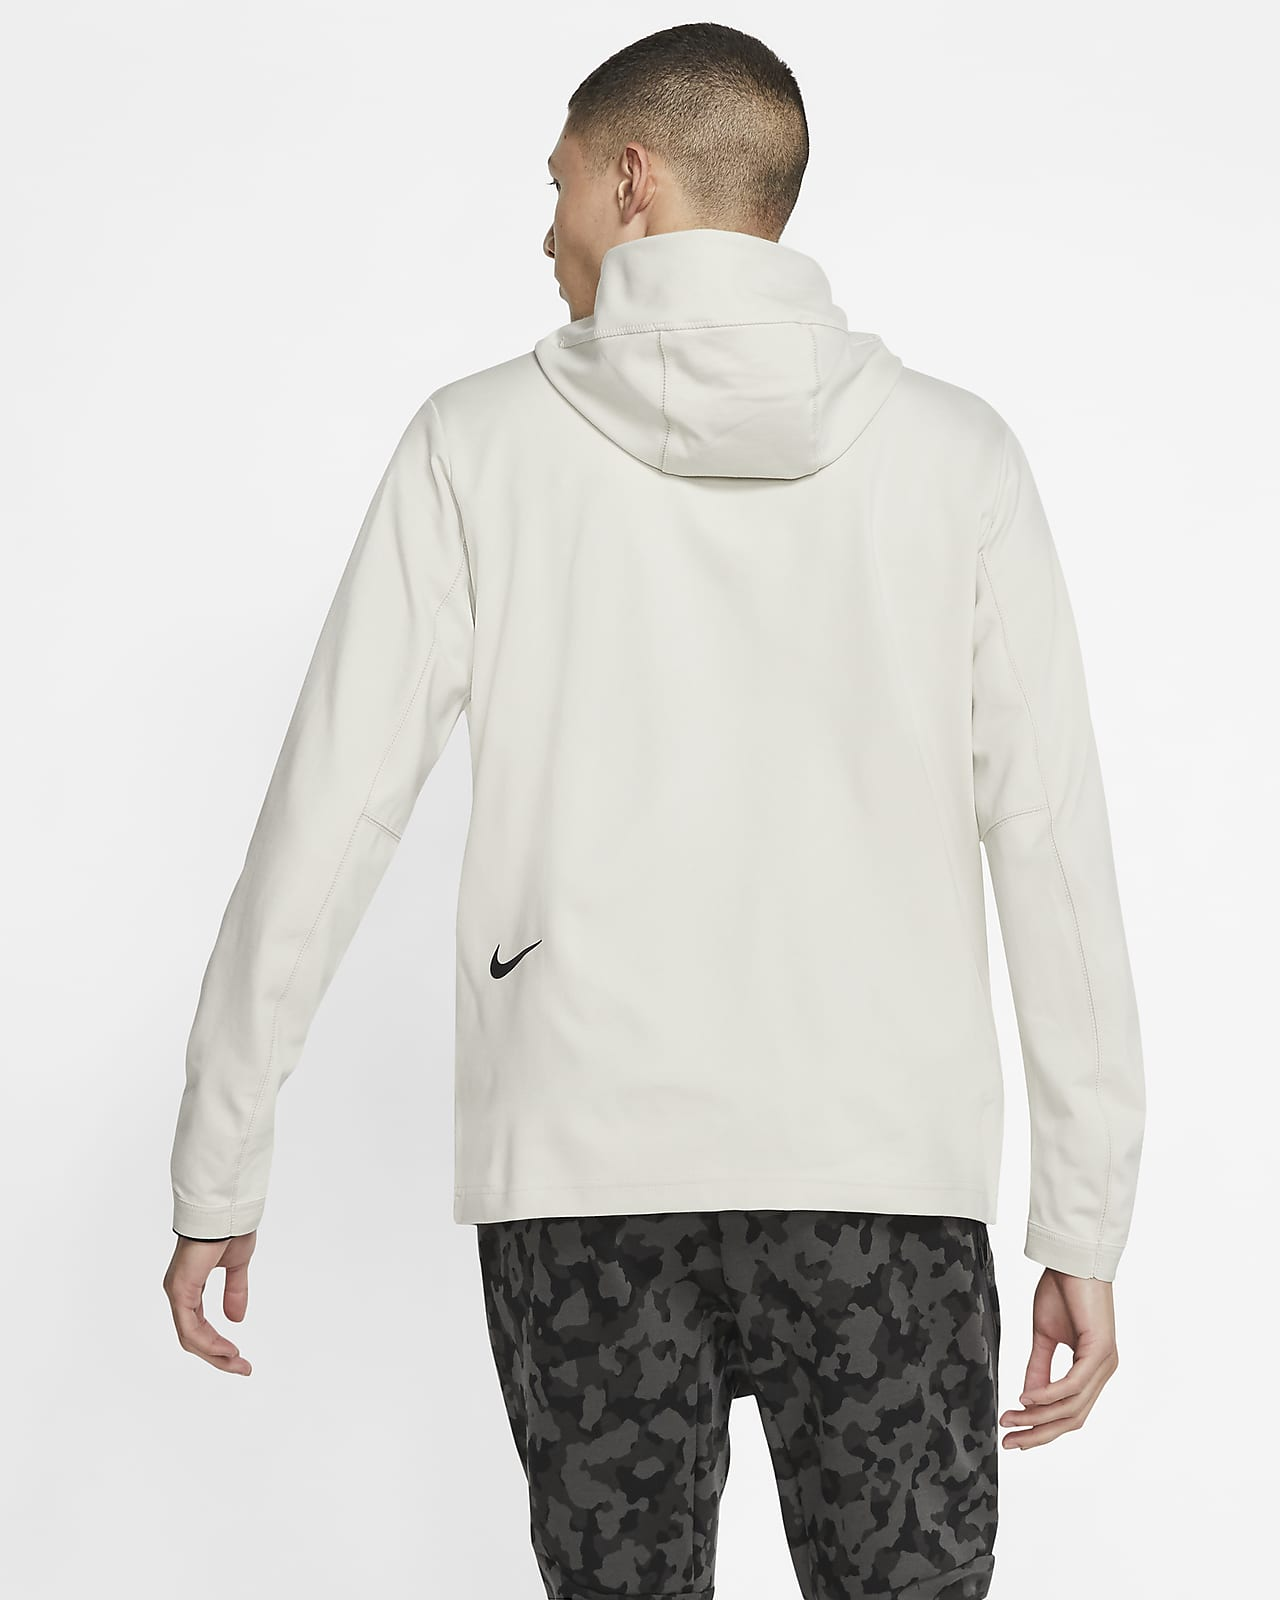 acampar Integración Afectar  Nike Sportswear Tech Pack Men's Hooded Full-Zip Jacket. Nike SA